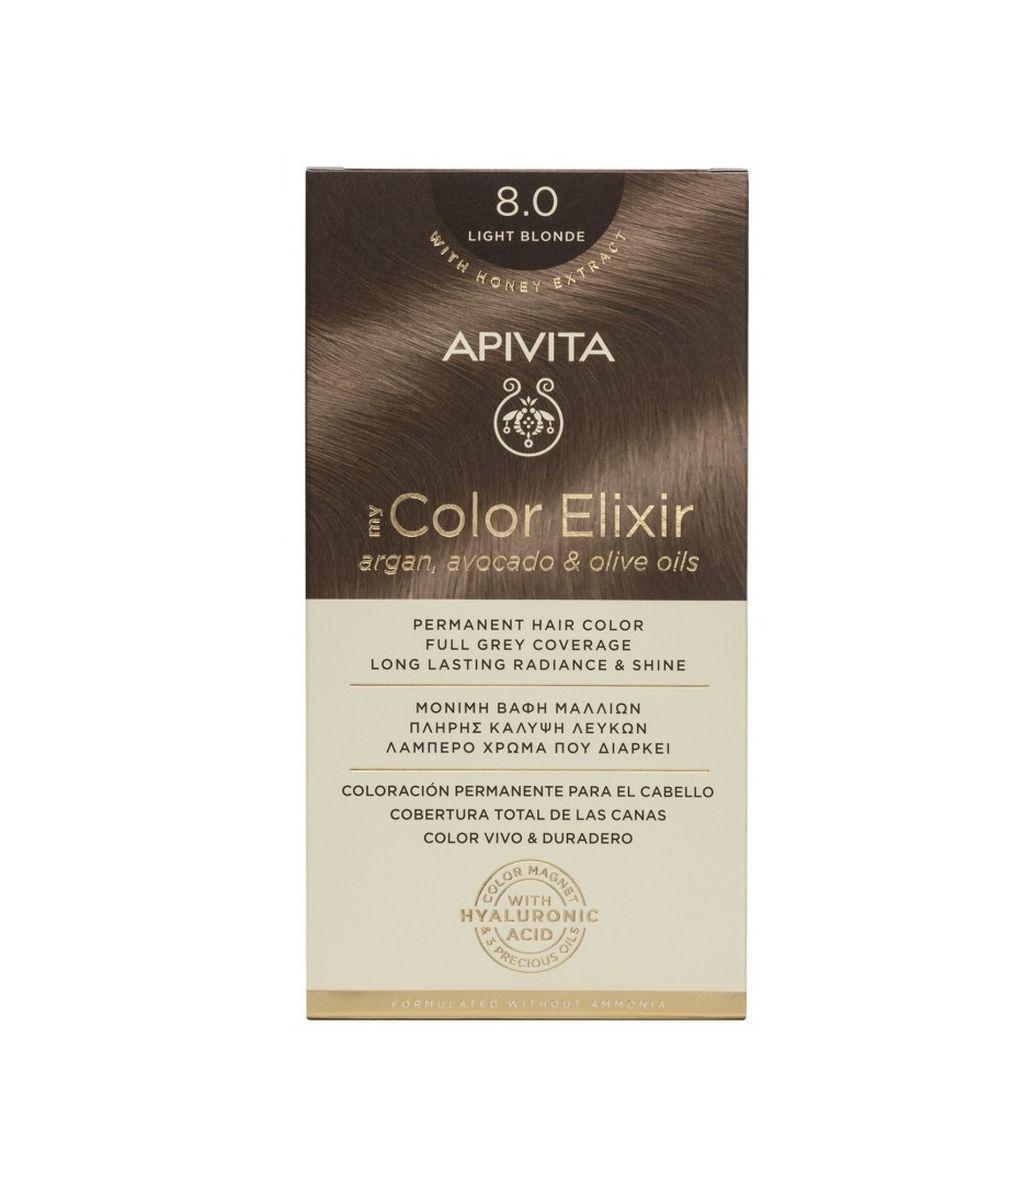 apivita-my-color-elixir-tinte-rubio-claro-n-8-0